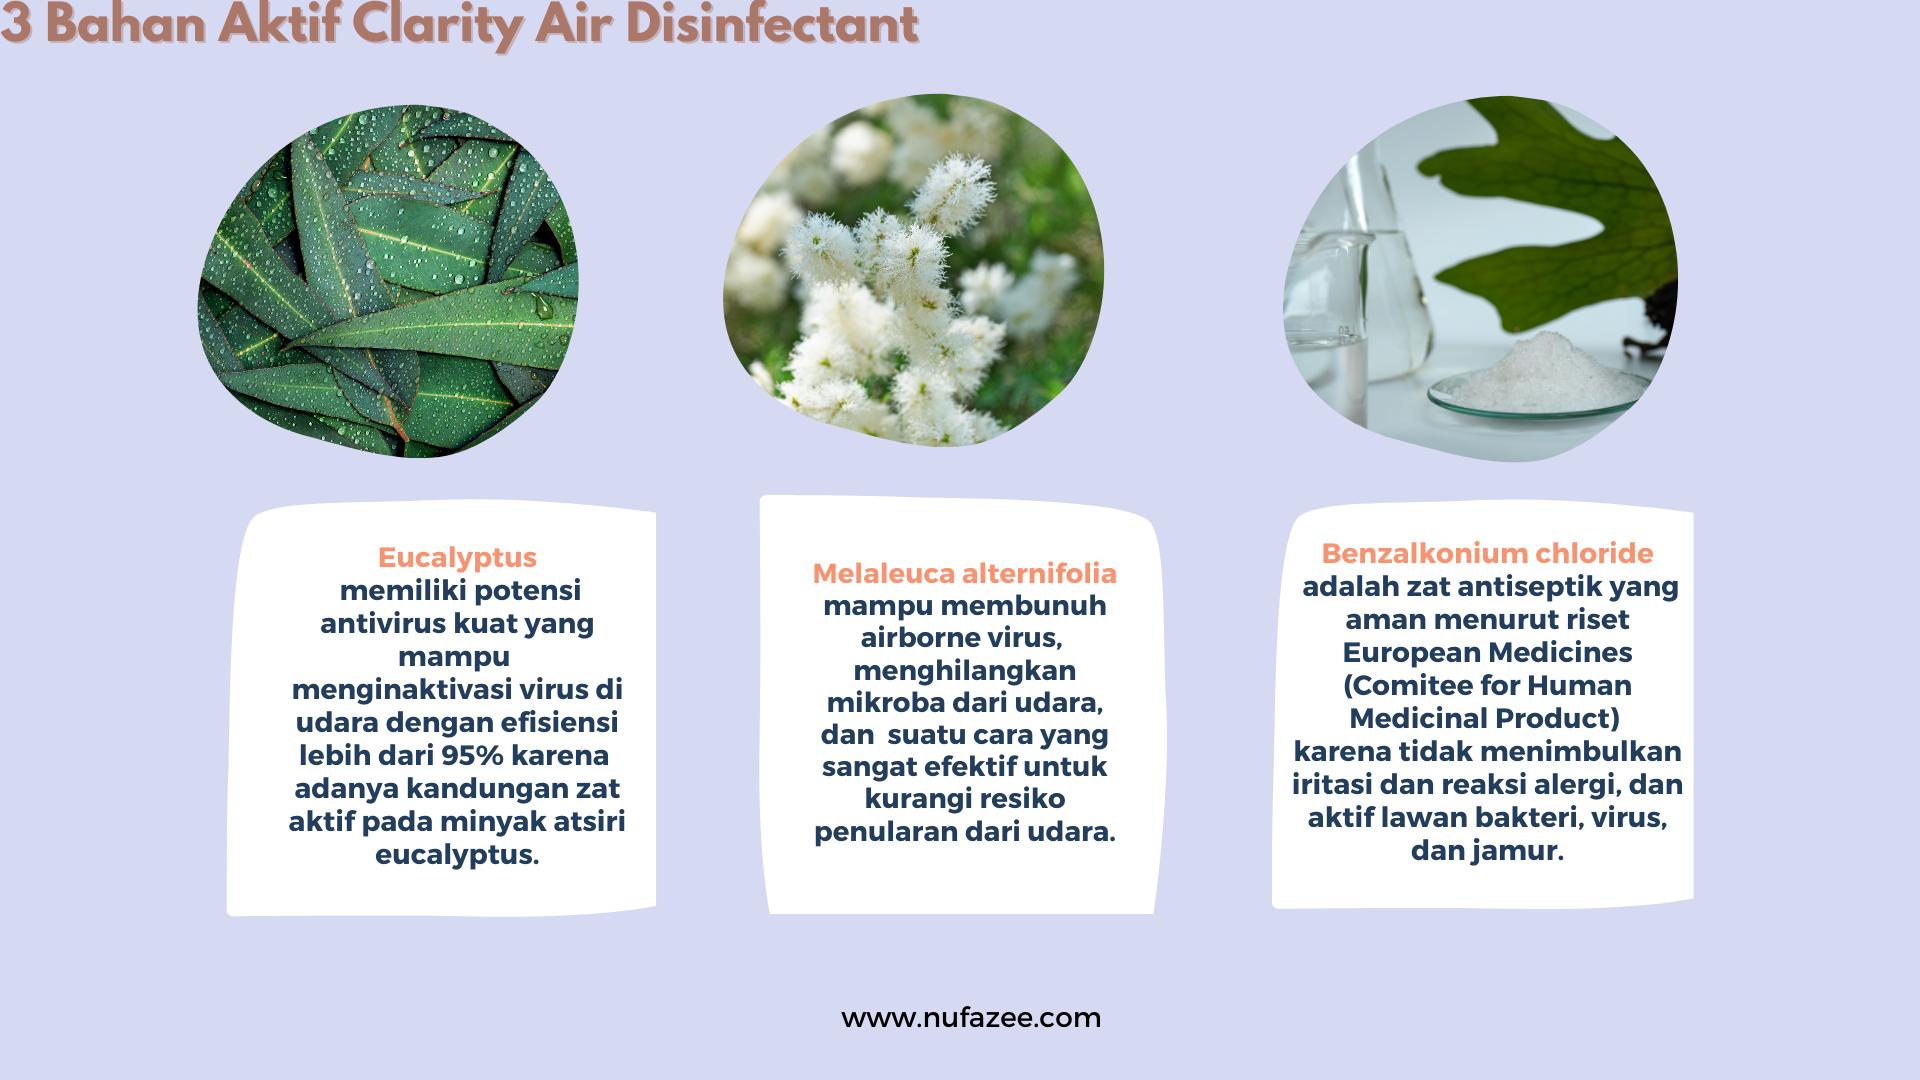 Clarity Air Disinfectant 9